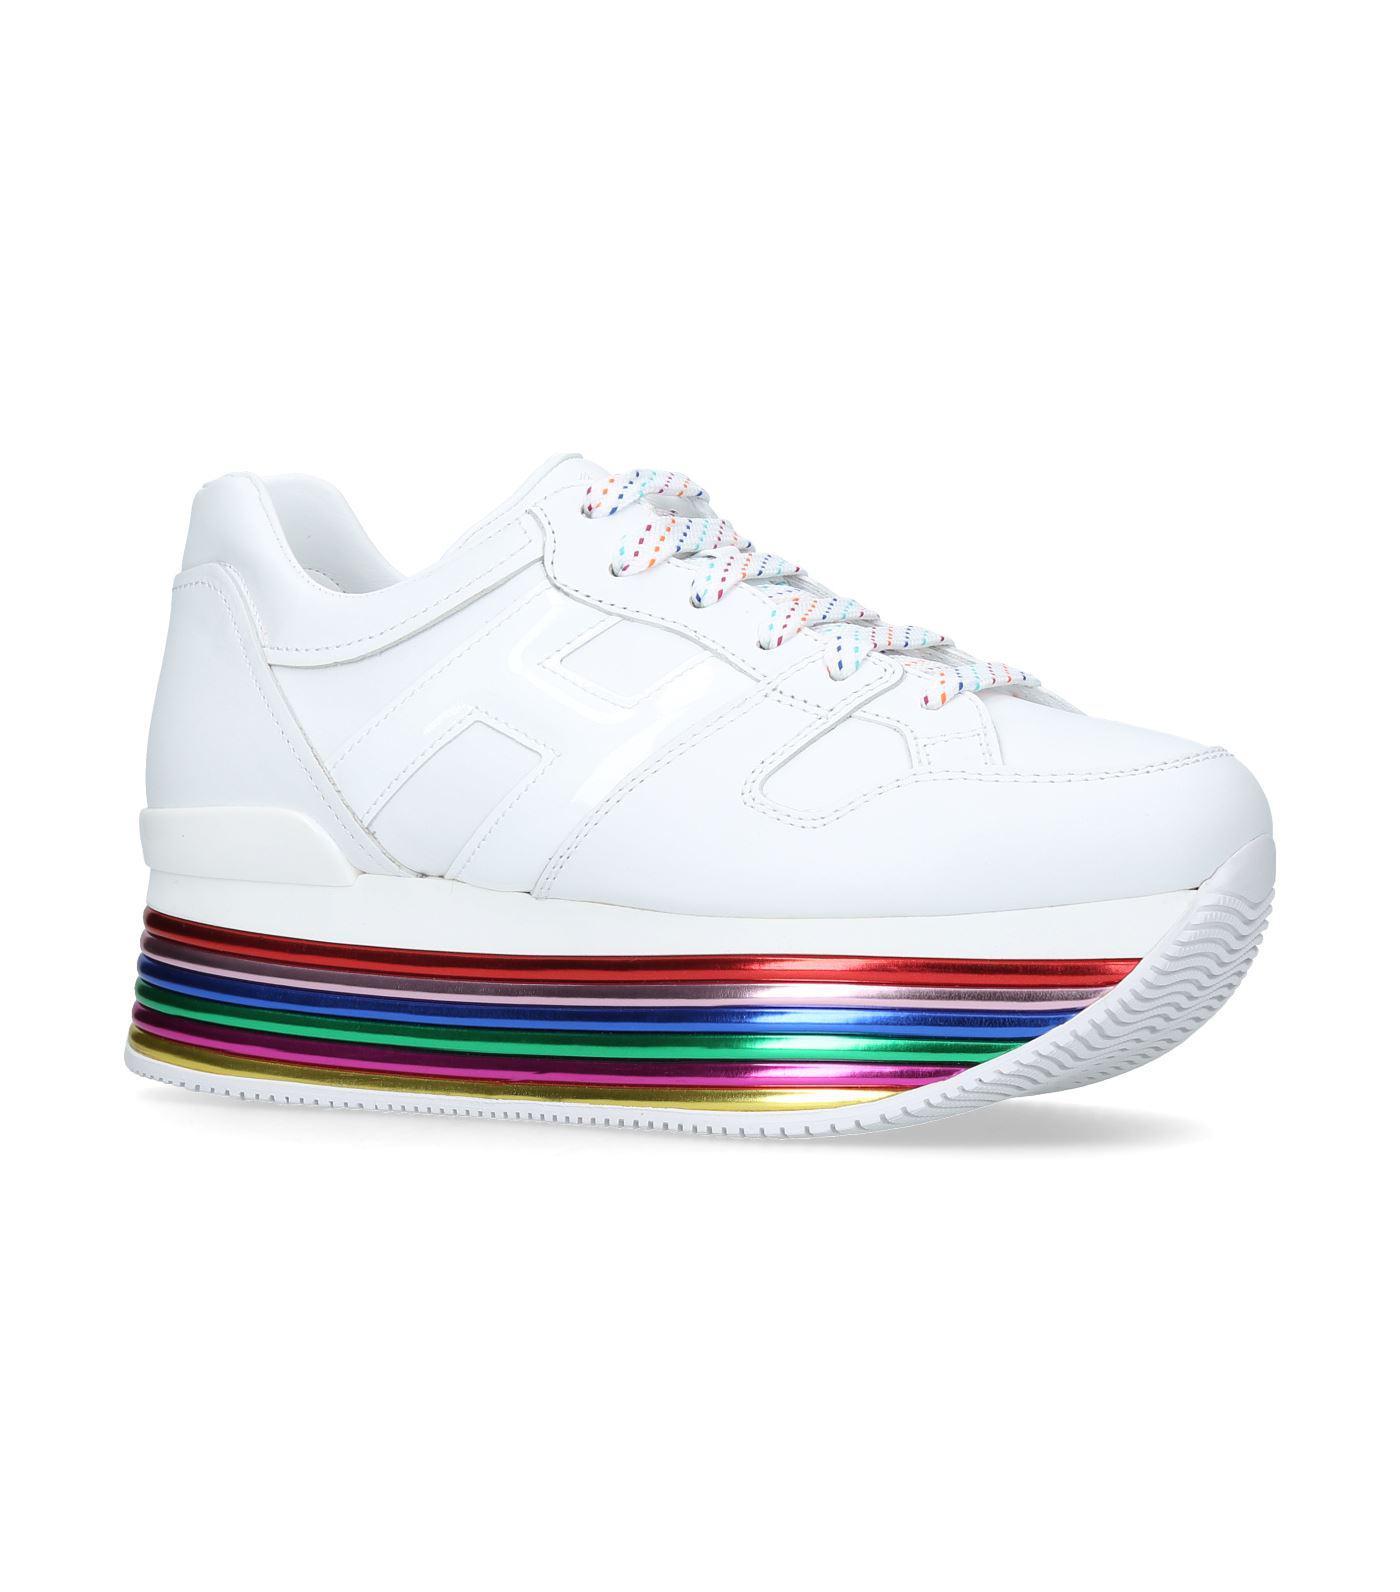 Hogan Maxi 222 Mignon Leather Sneaker in White for Men - Lyst